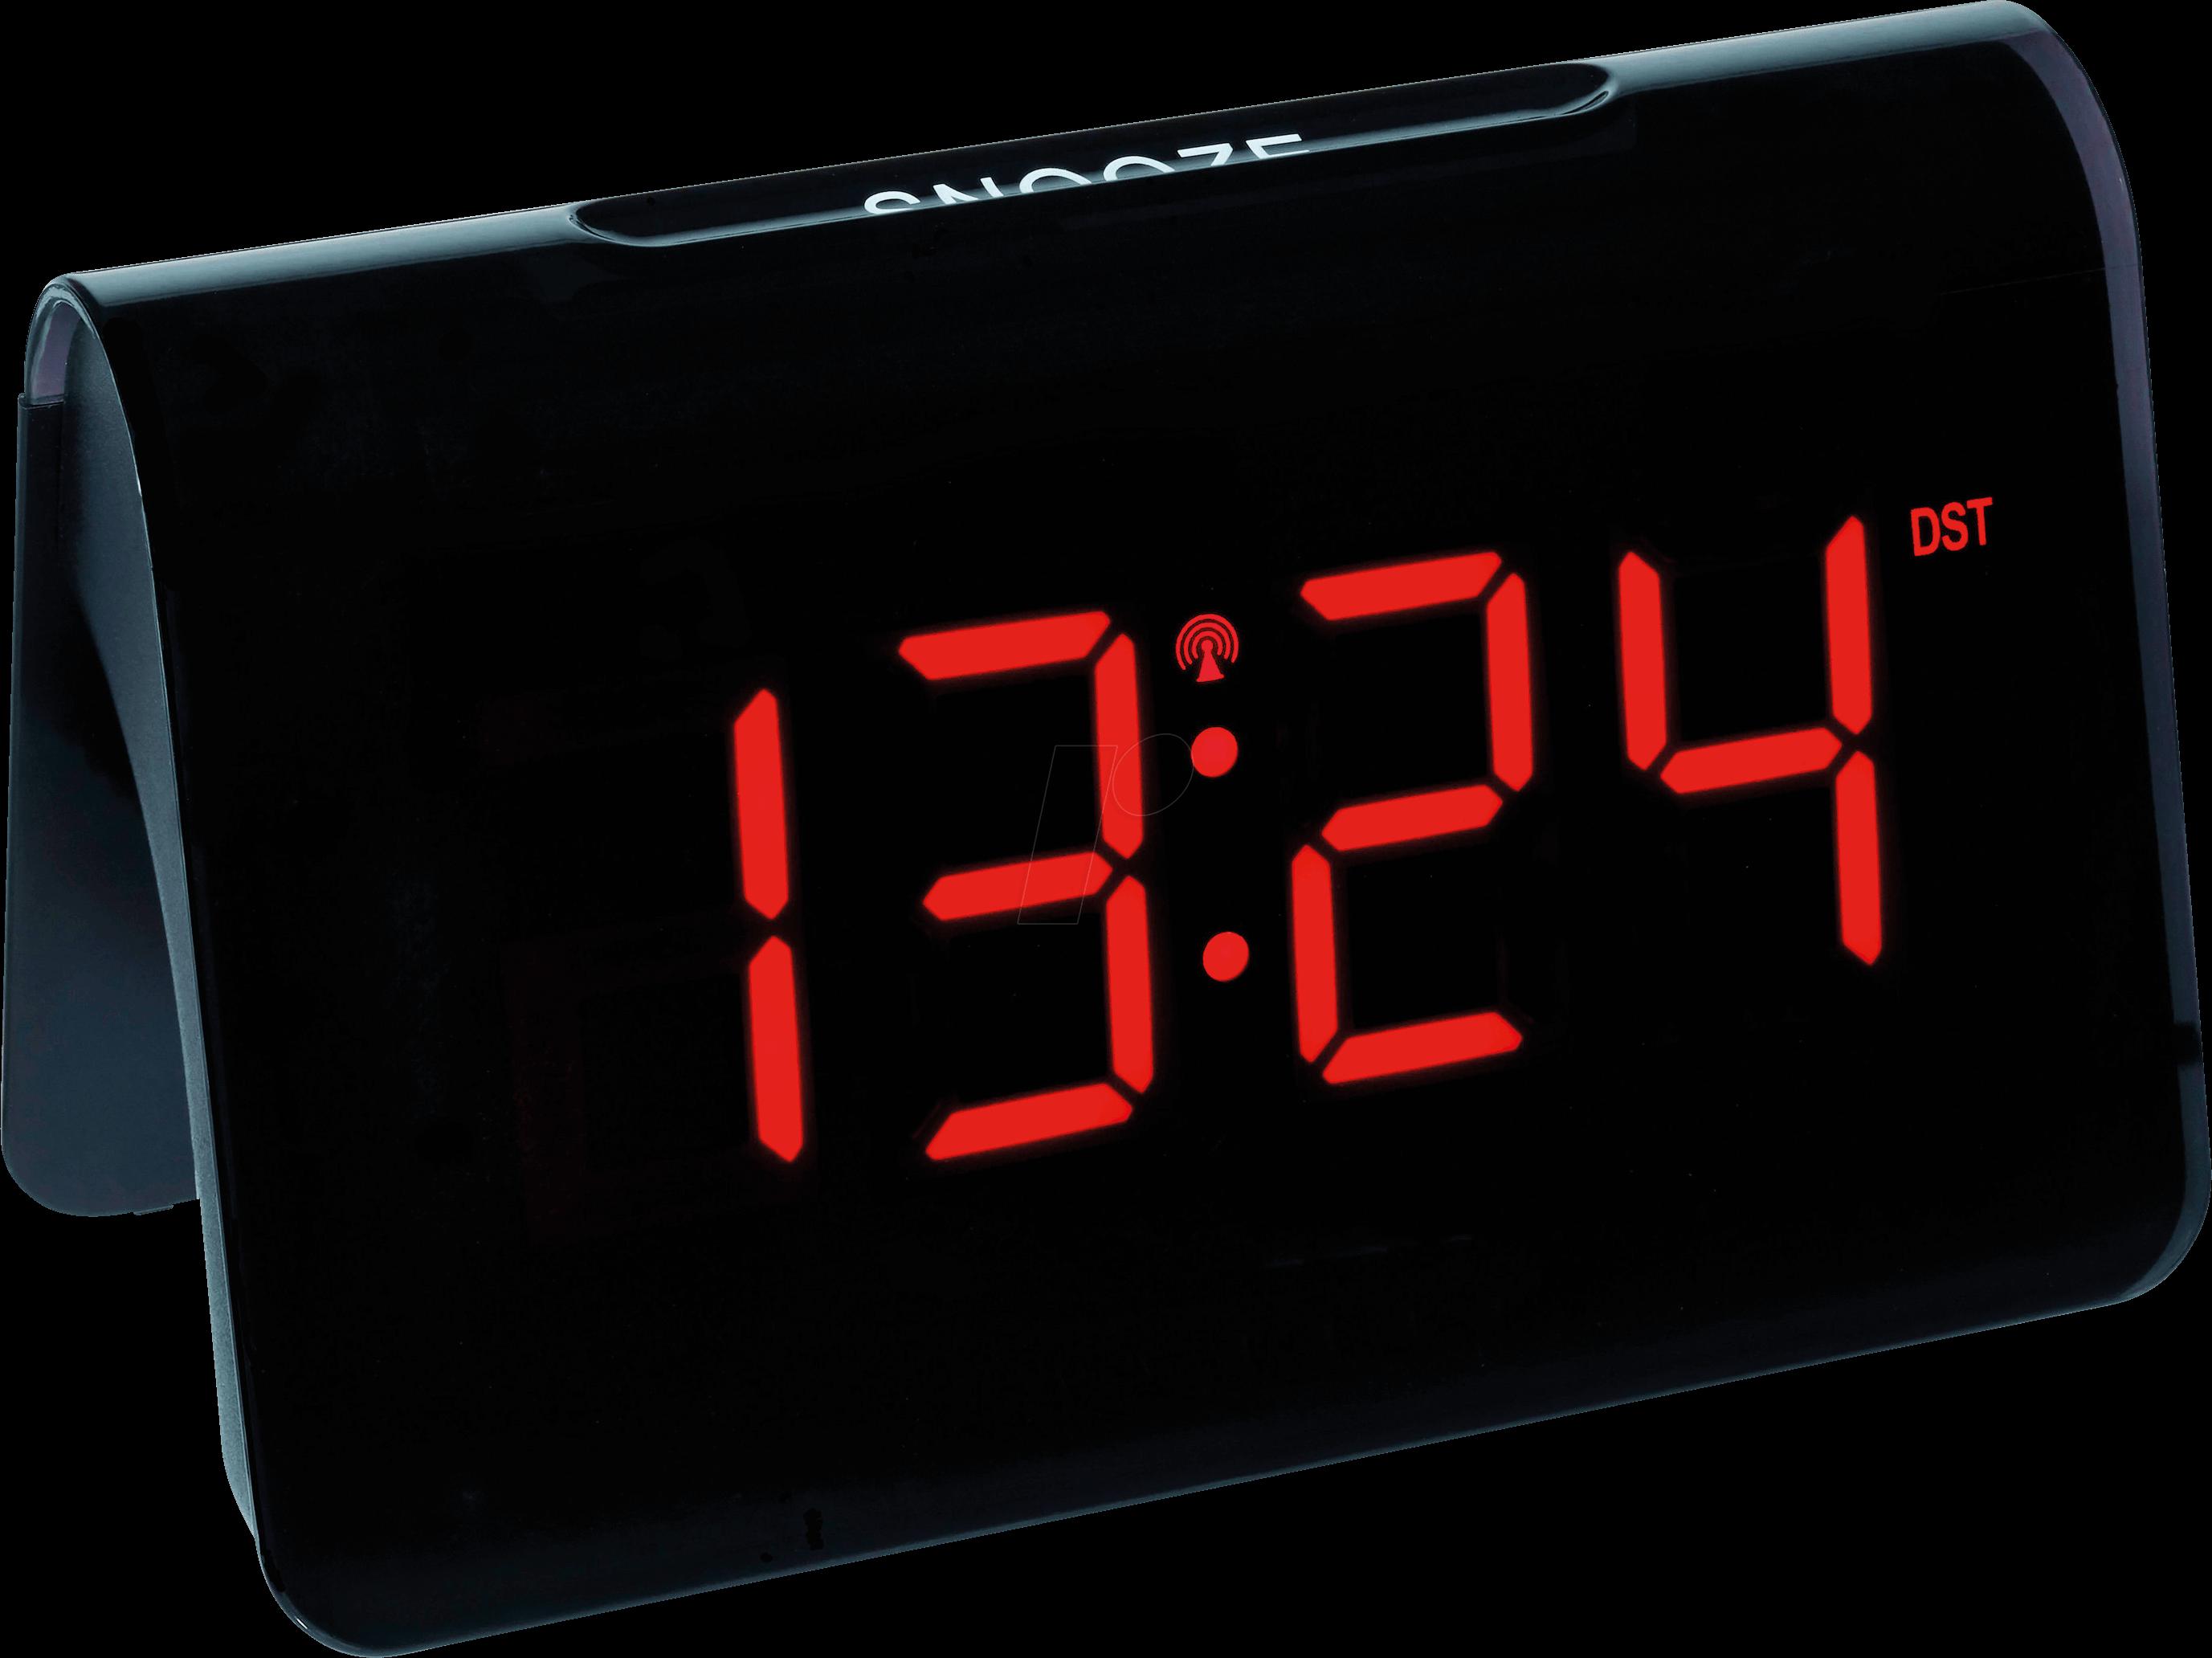 TFA 60254305 - Radio alarm clock, black, red LED display